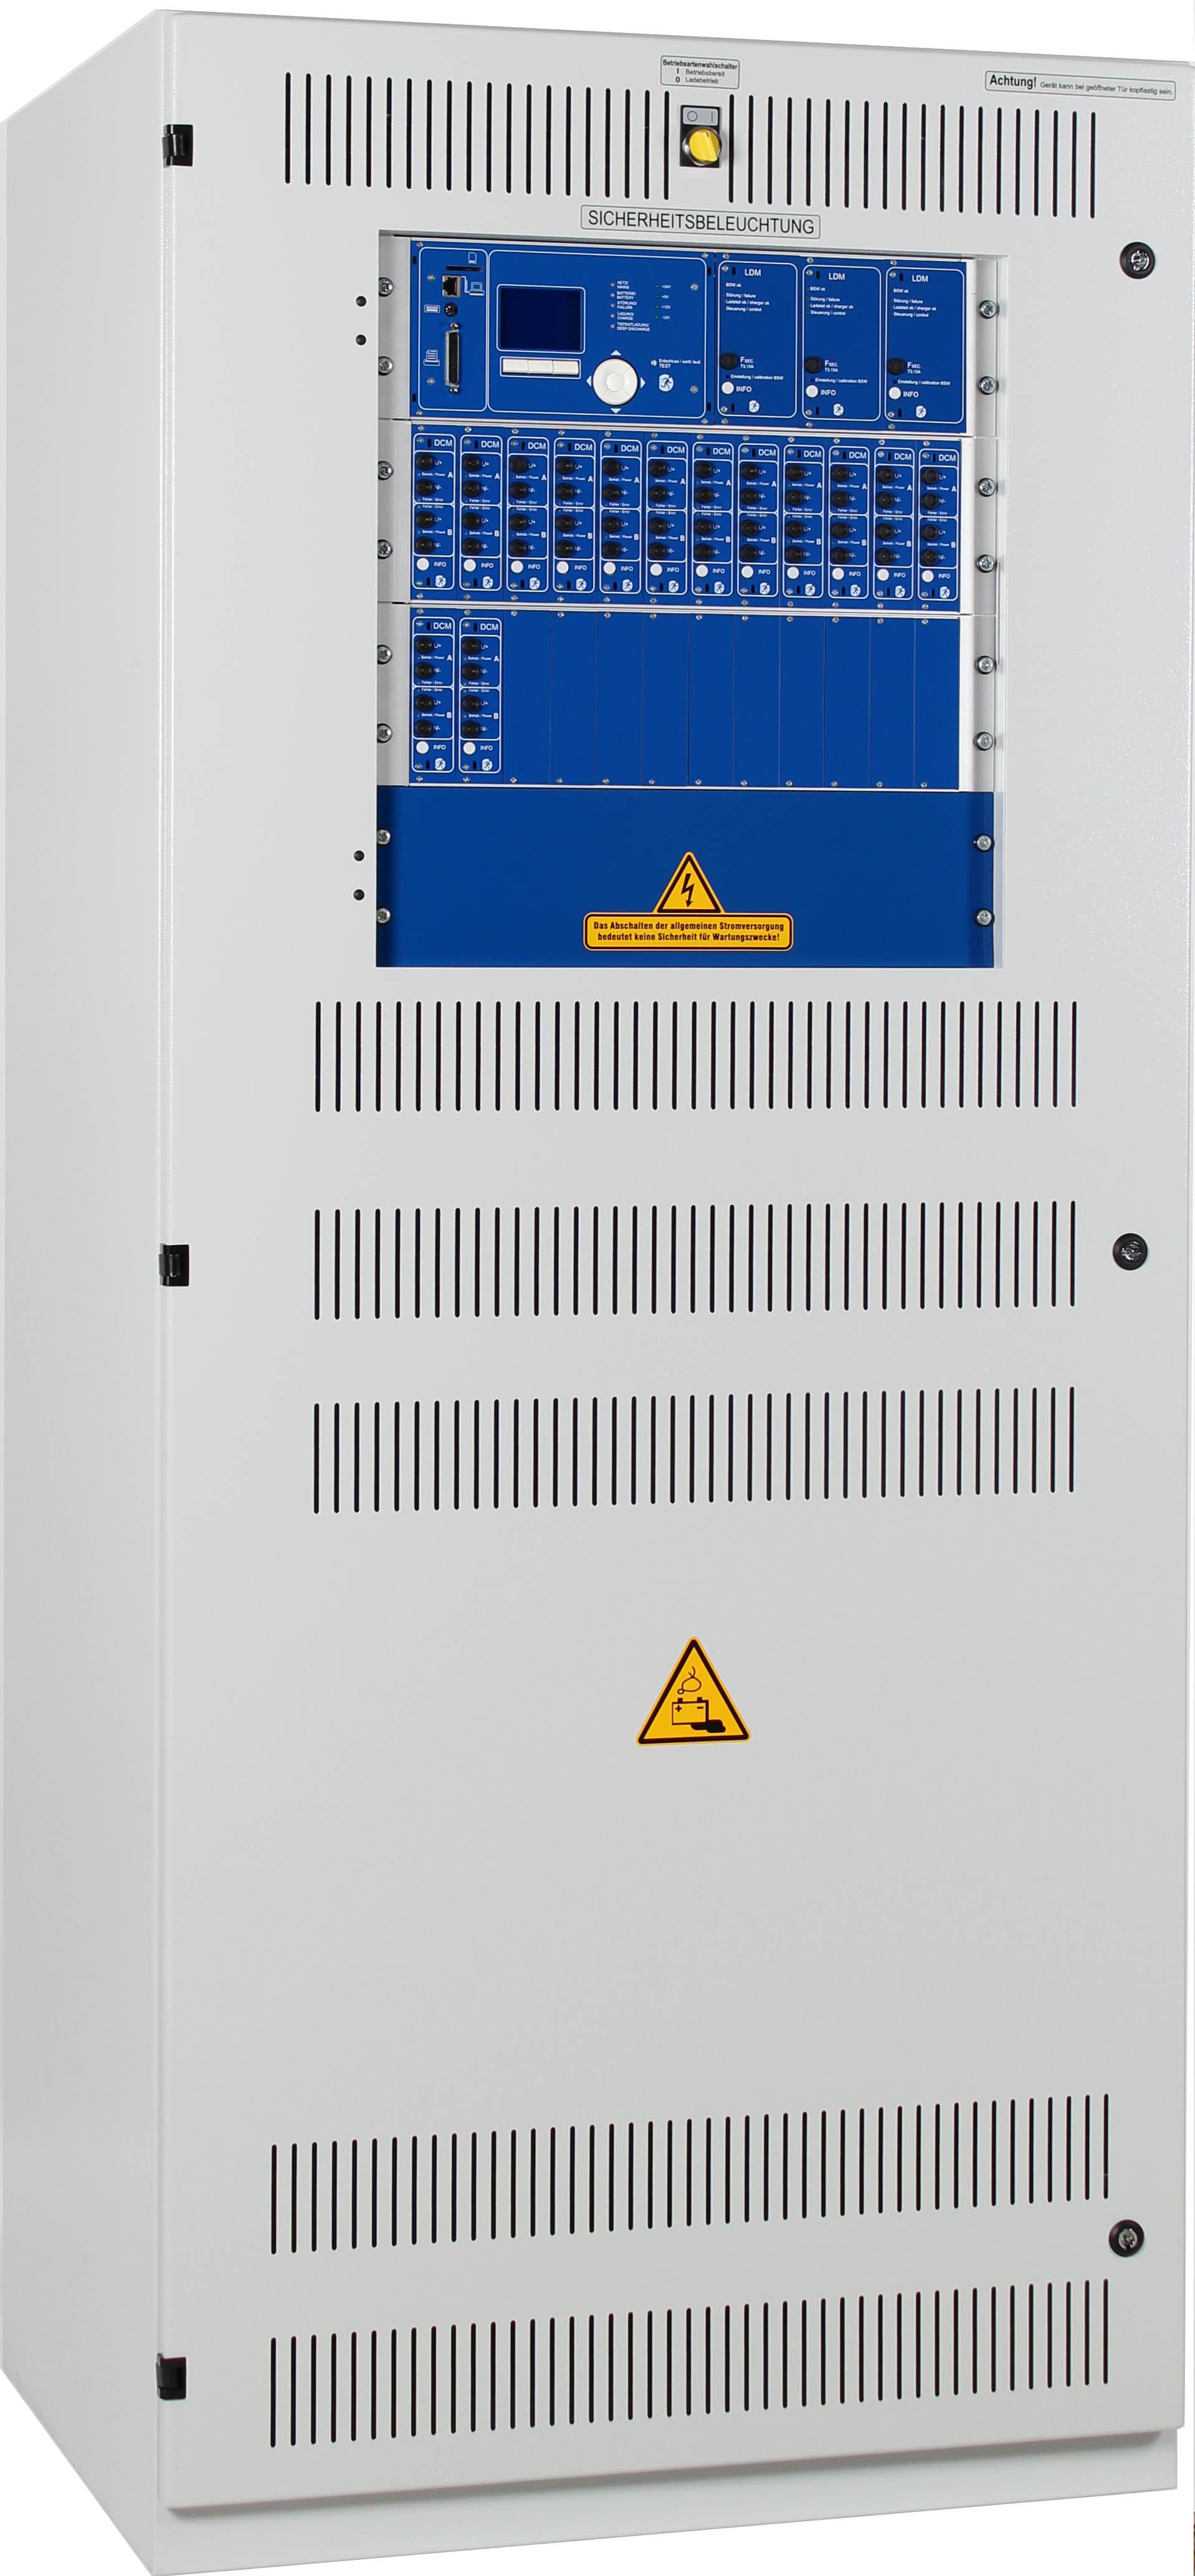 1 Stk Zentralbatterieanlage MaxiControl, 60/7,5A, ohne DCM NLMCX360--